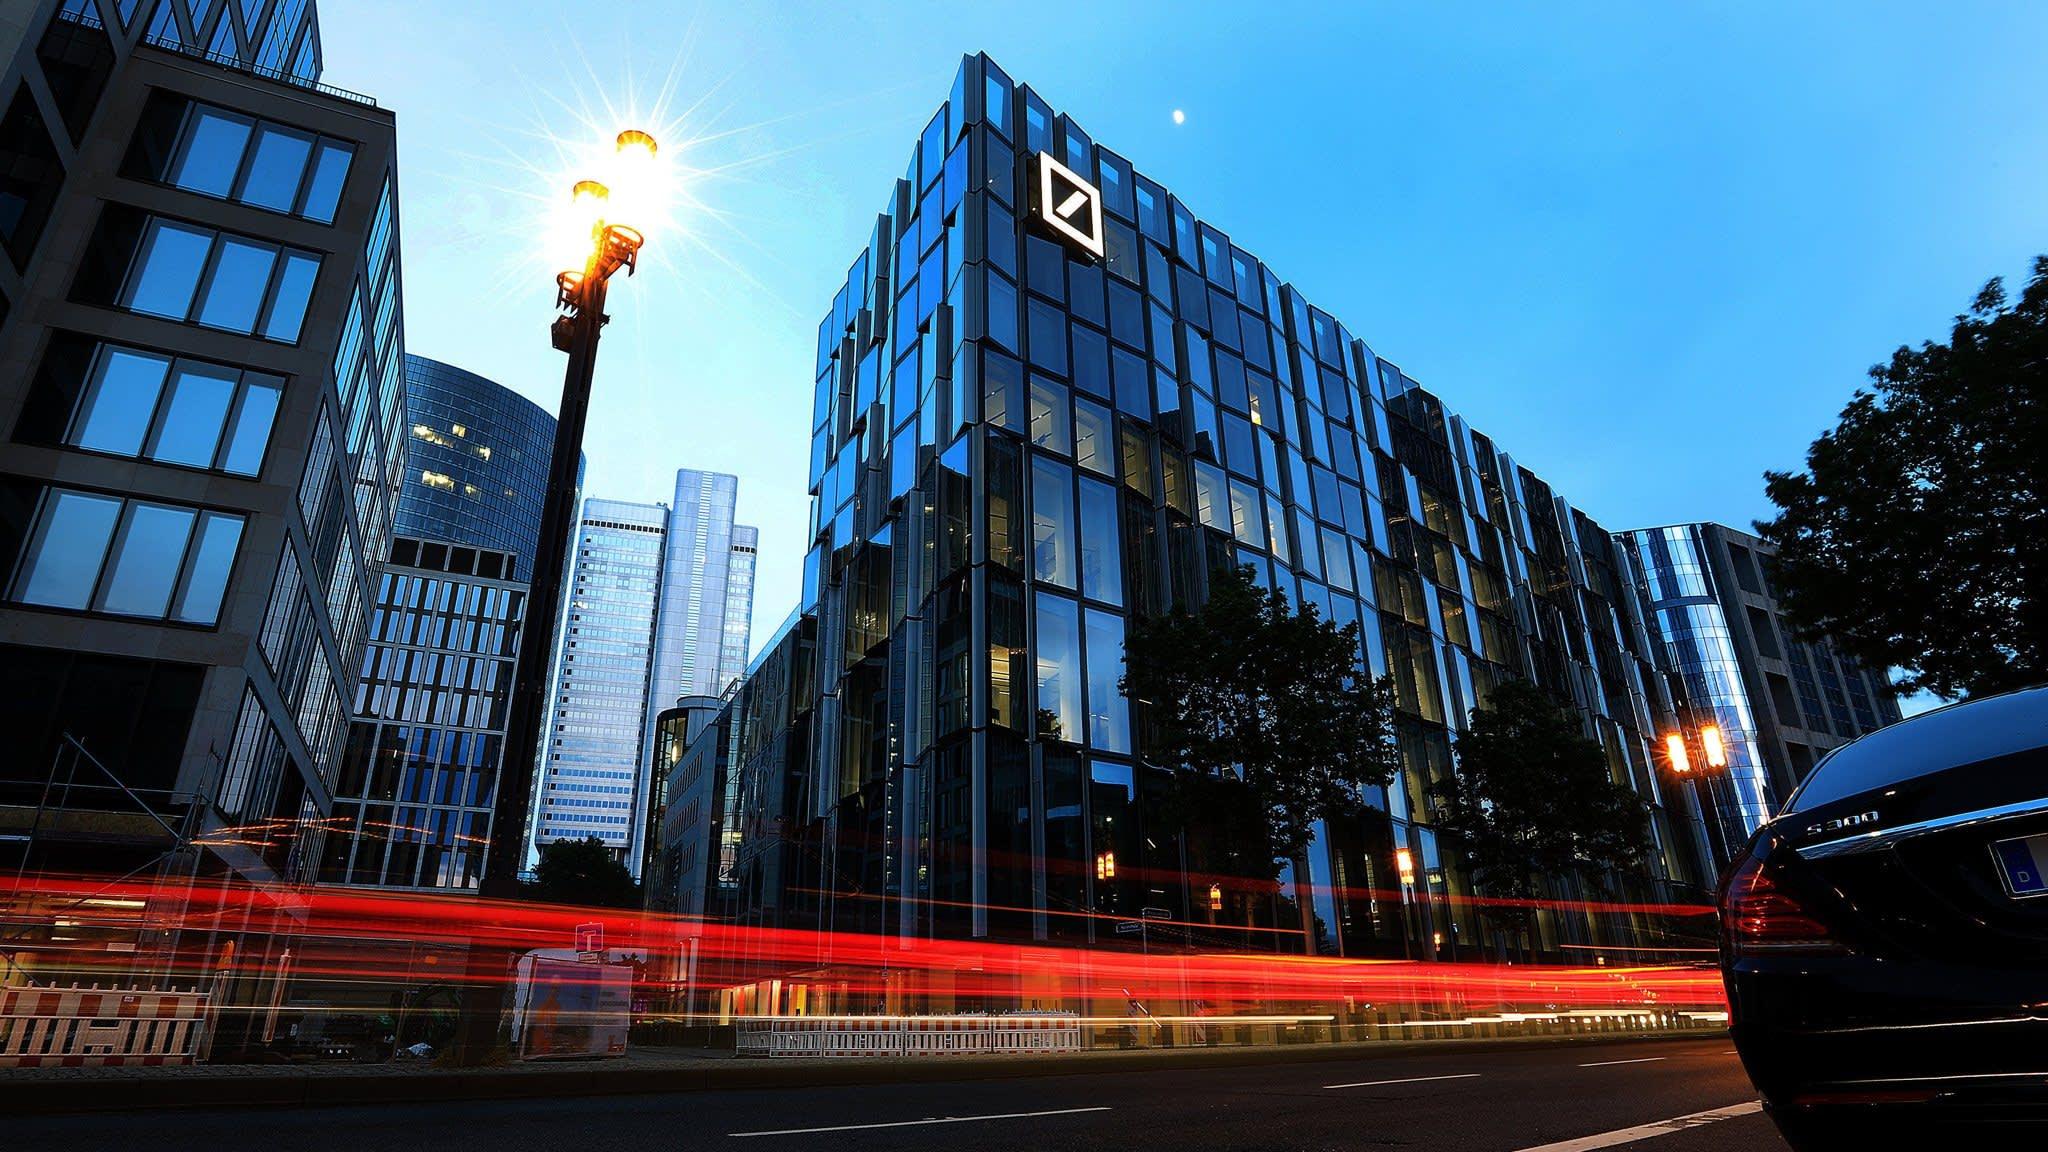 Watchdog orders Deutsche Bank to take action on money laundering